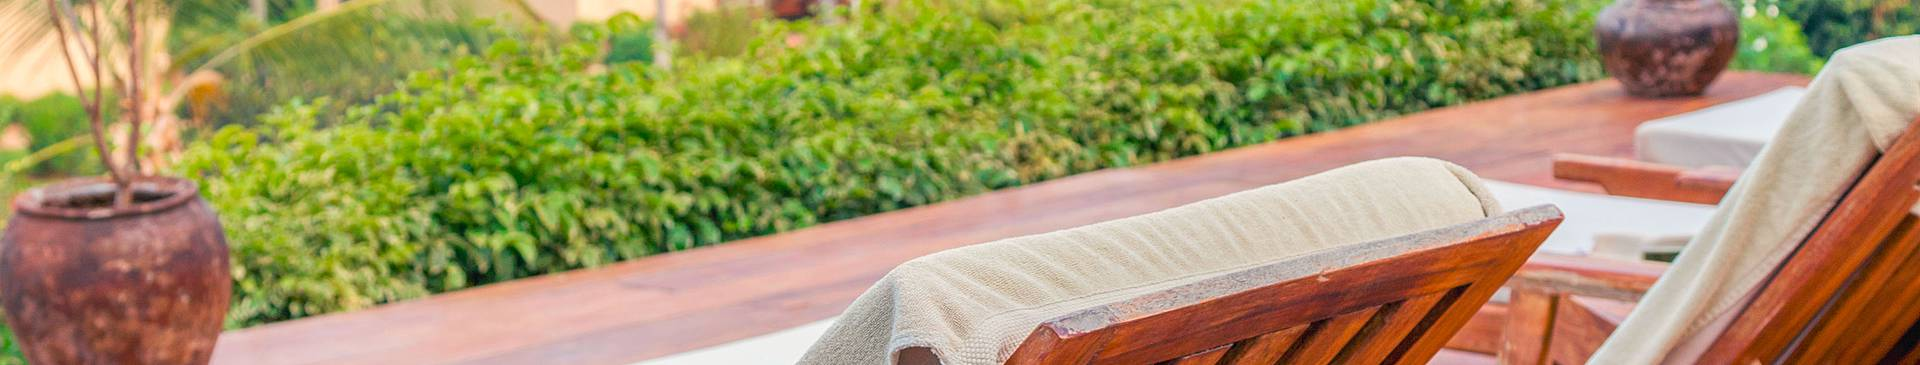 Wellness retreats in Tanzania